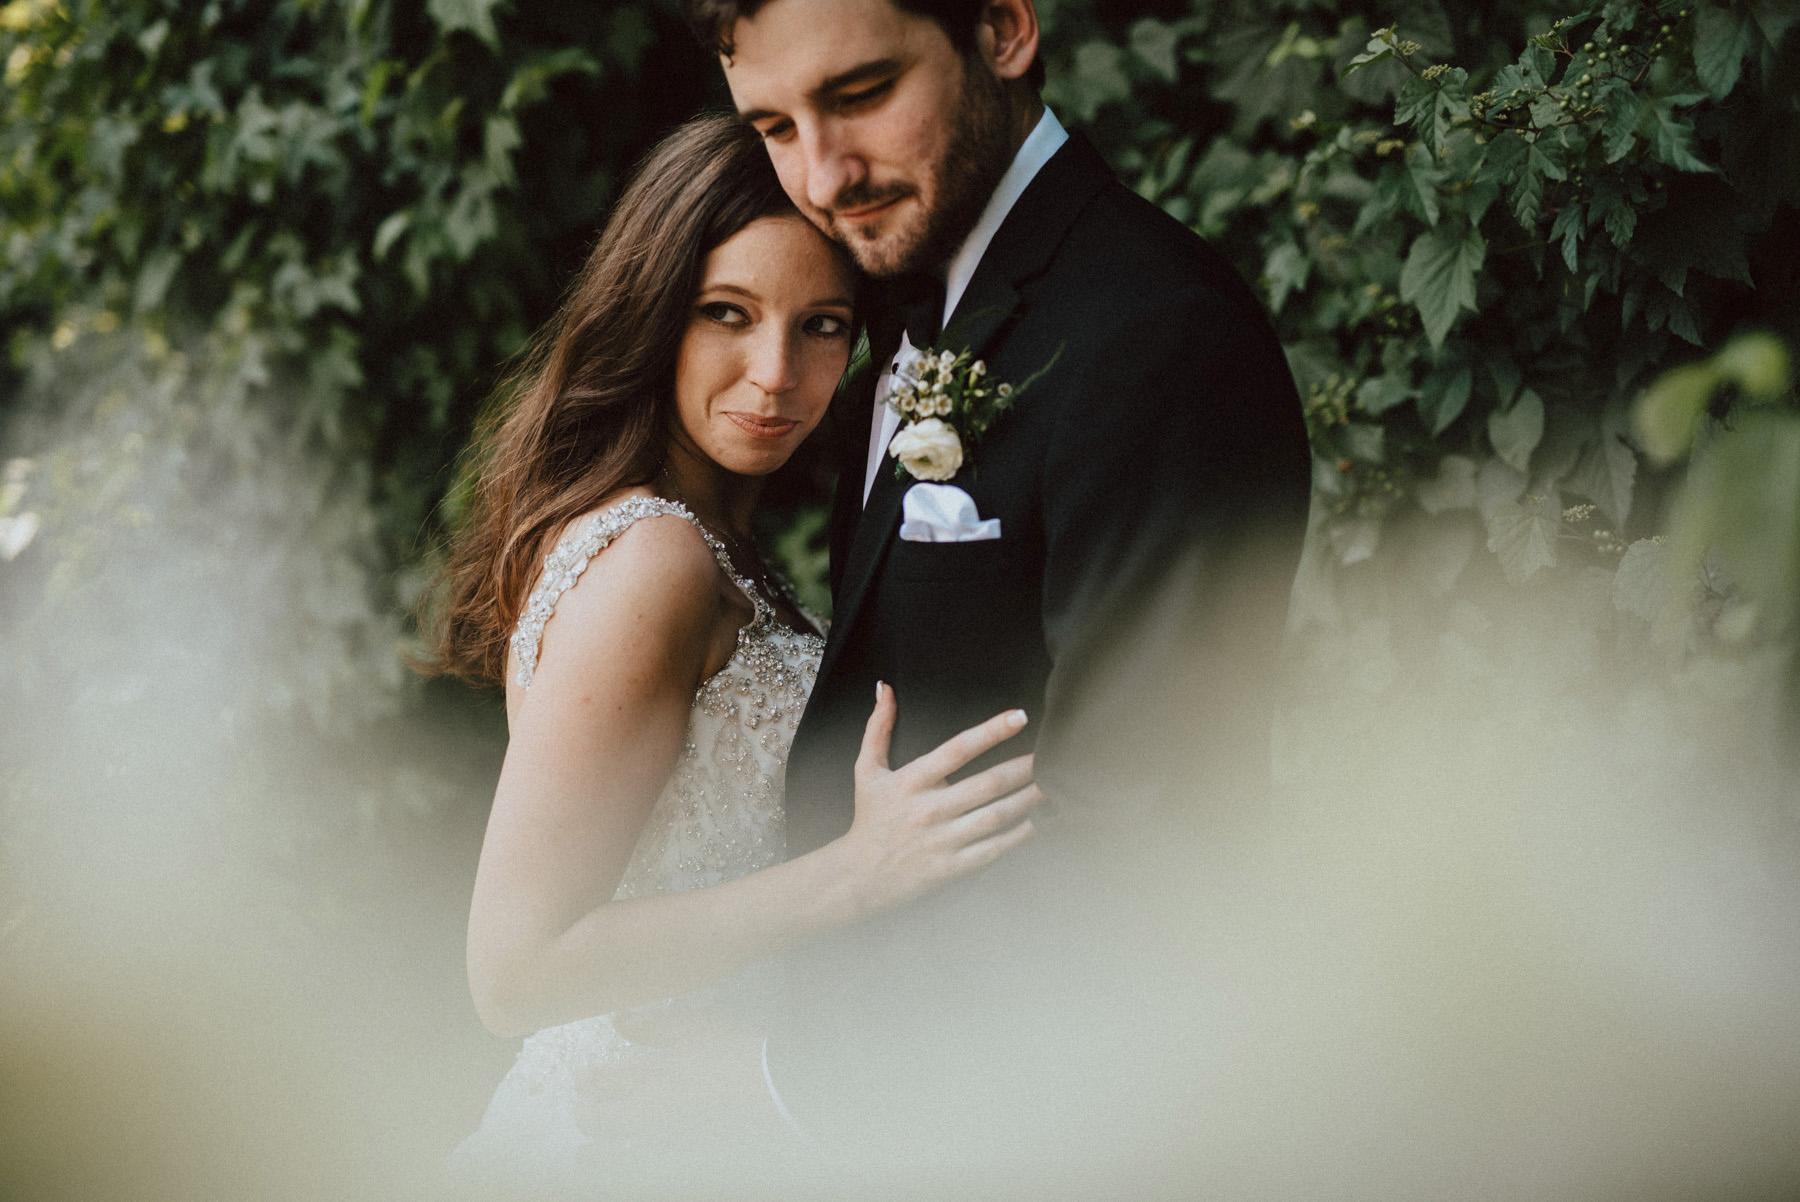 077-carinwood-estate-wedding-7.jpg